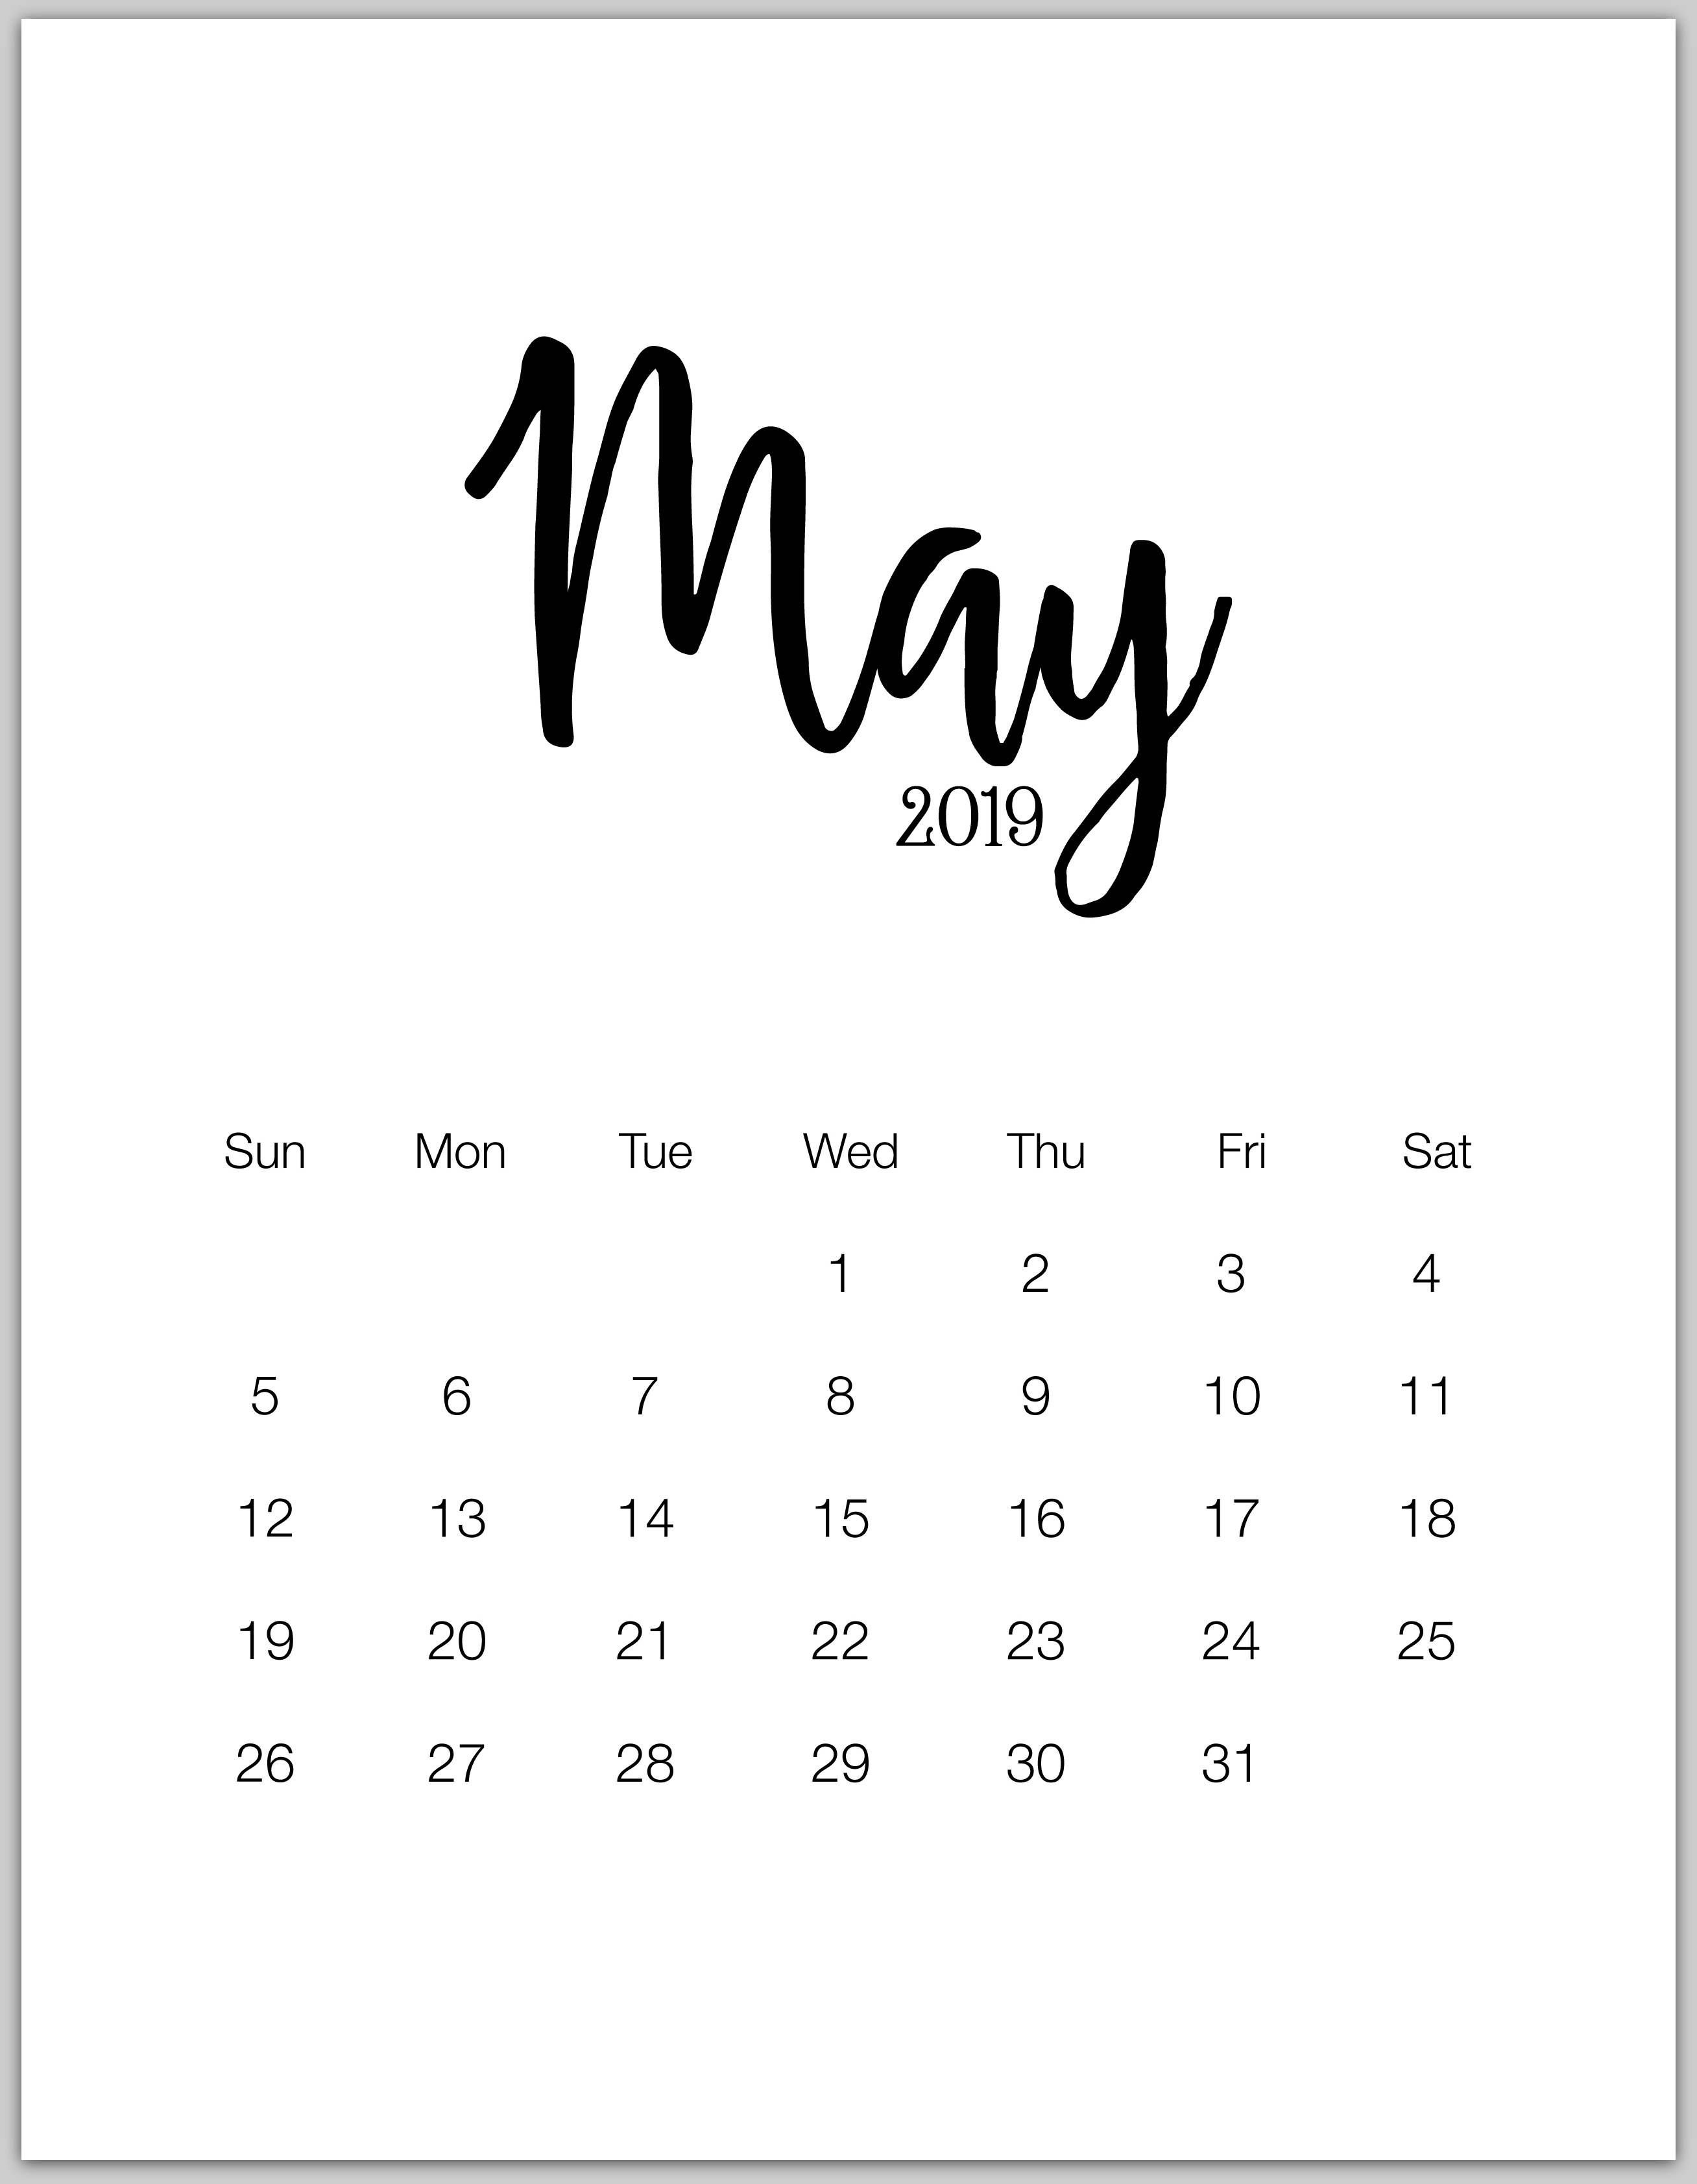 May 2019 Calendar Wallpapers - Wallpaper Cave May 8 2019 Calendar